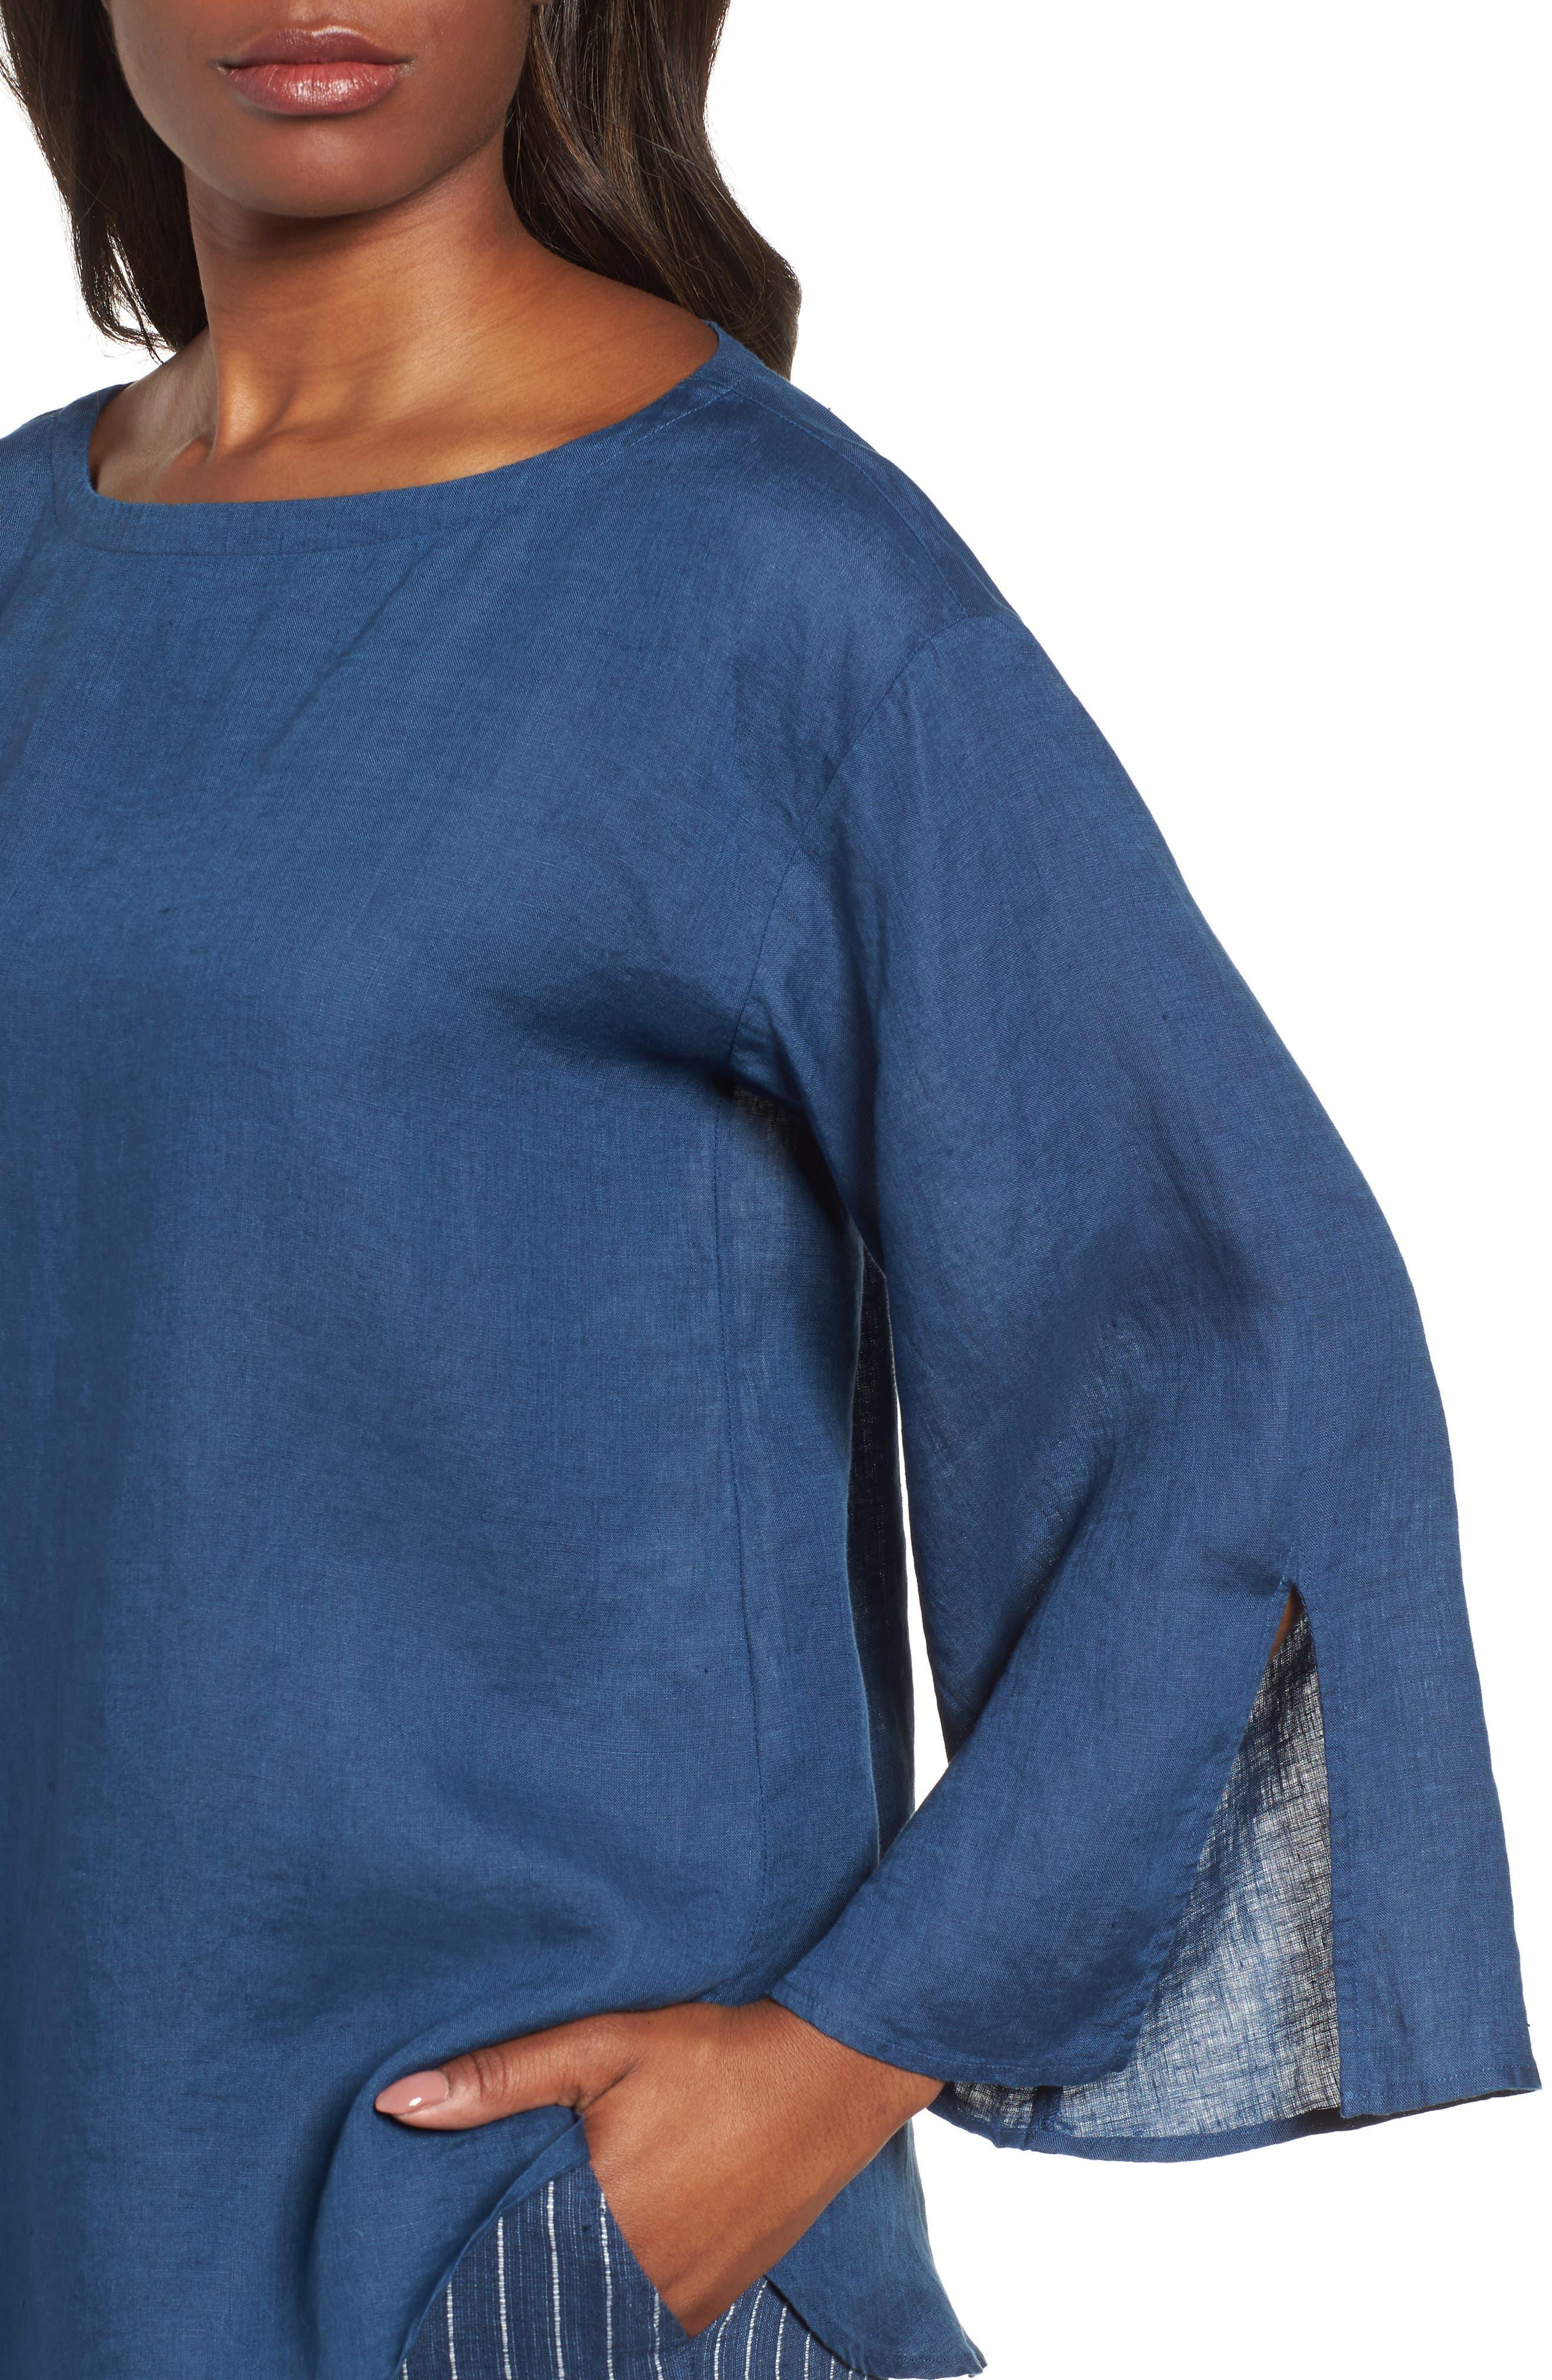 Woven Organic Linen Top,                             Alternate thumbnail 4, color,                             Denim